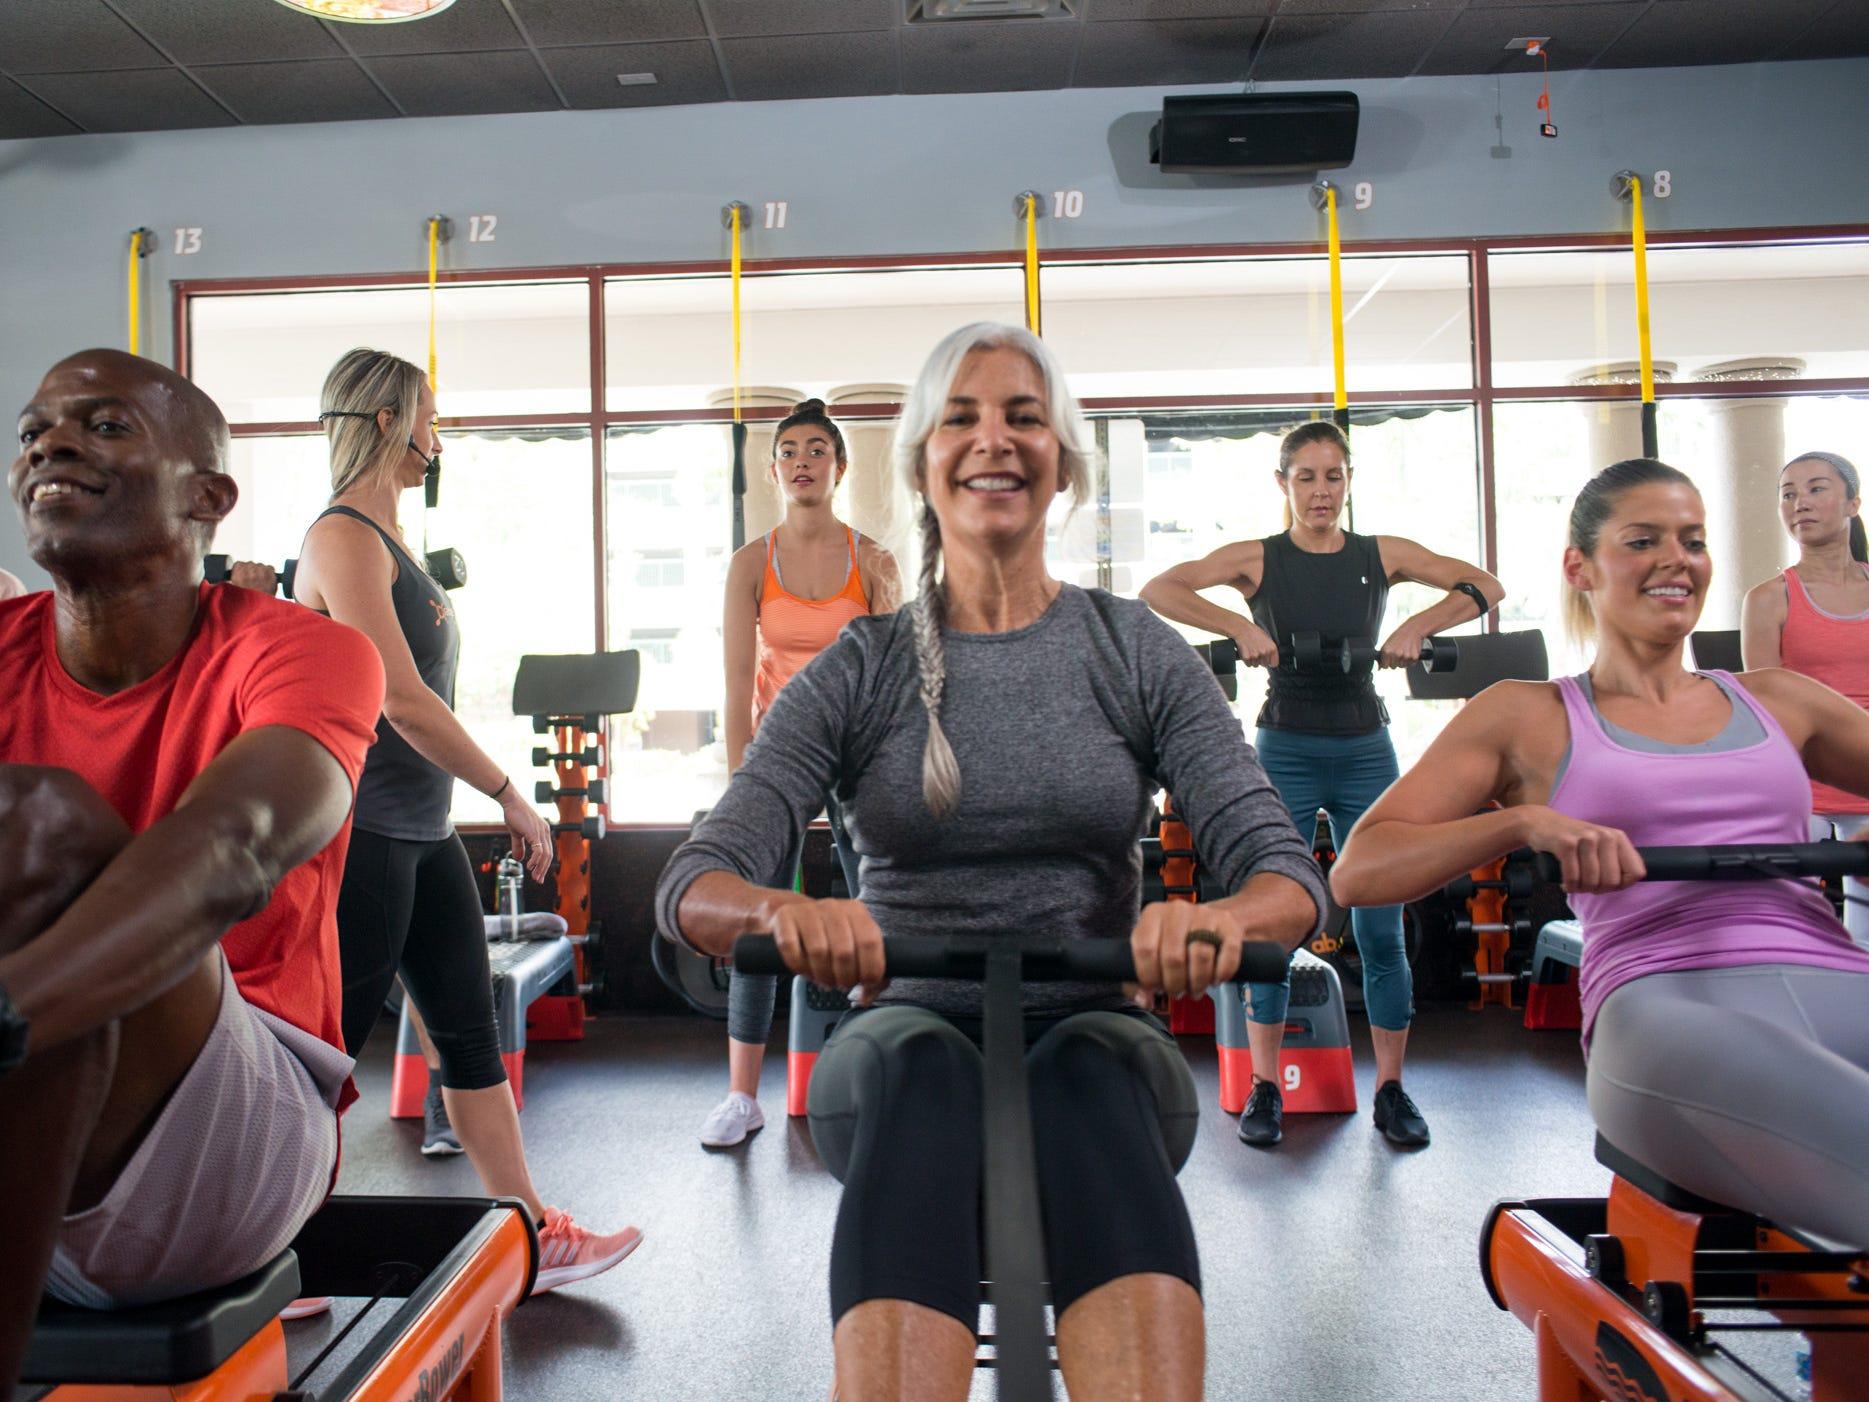 Orangetheory Fitness will open in Corpus Christi in December 2018.